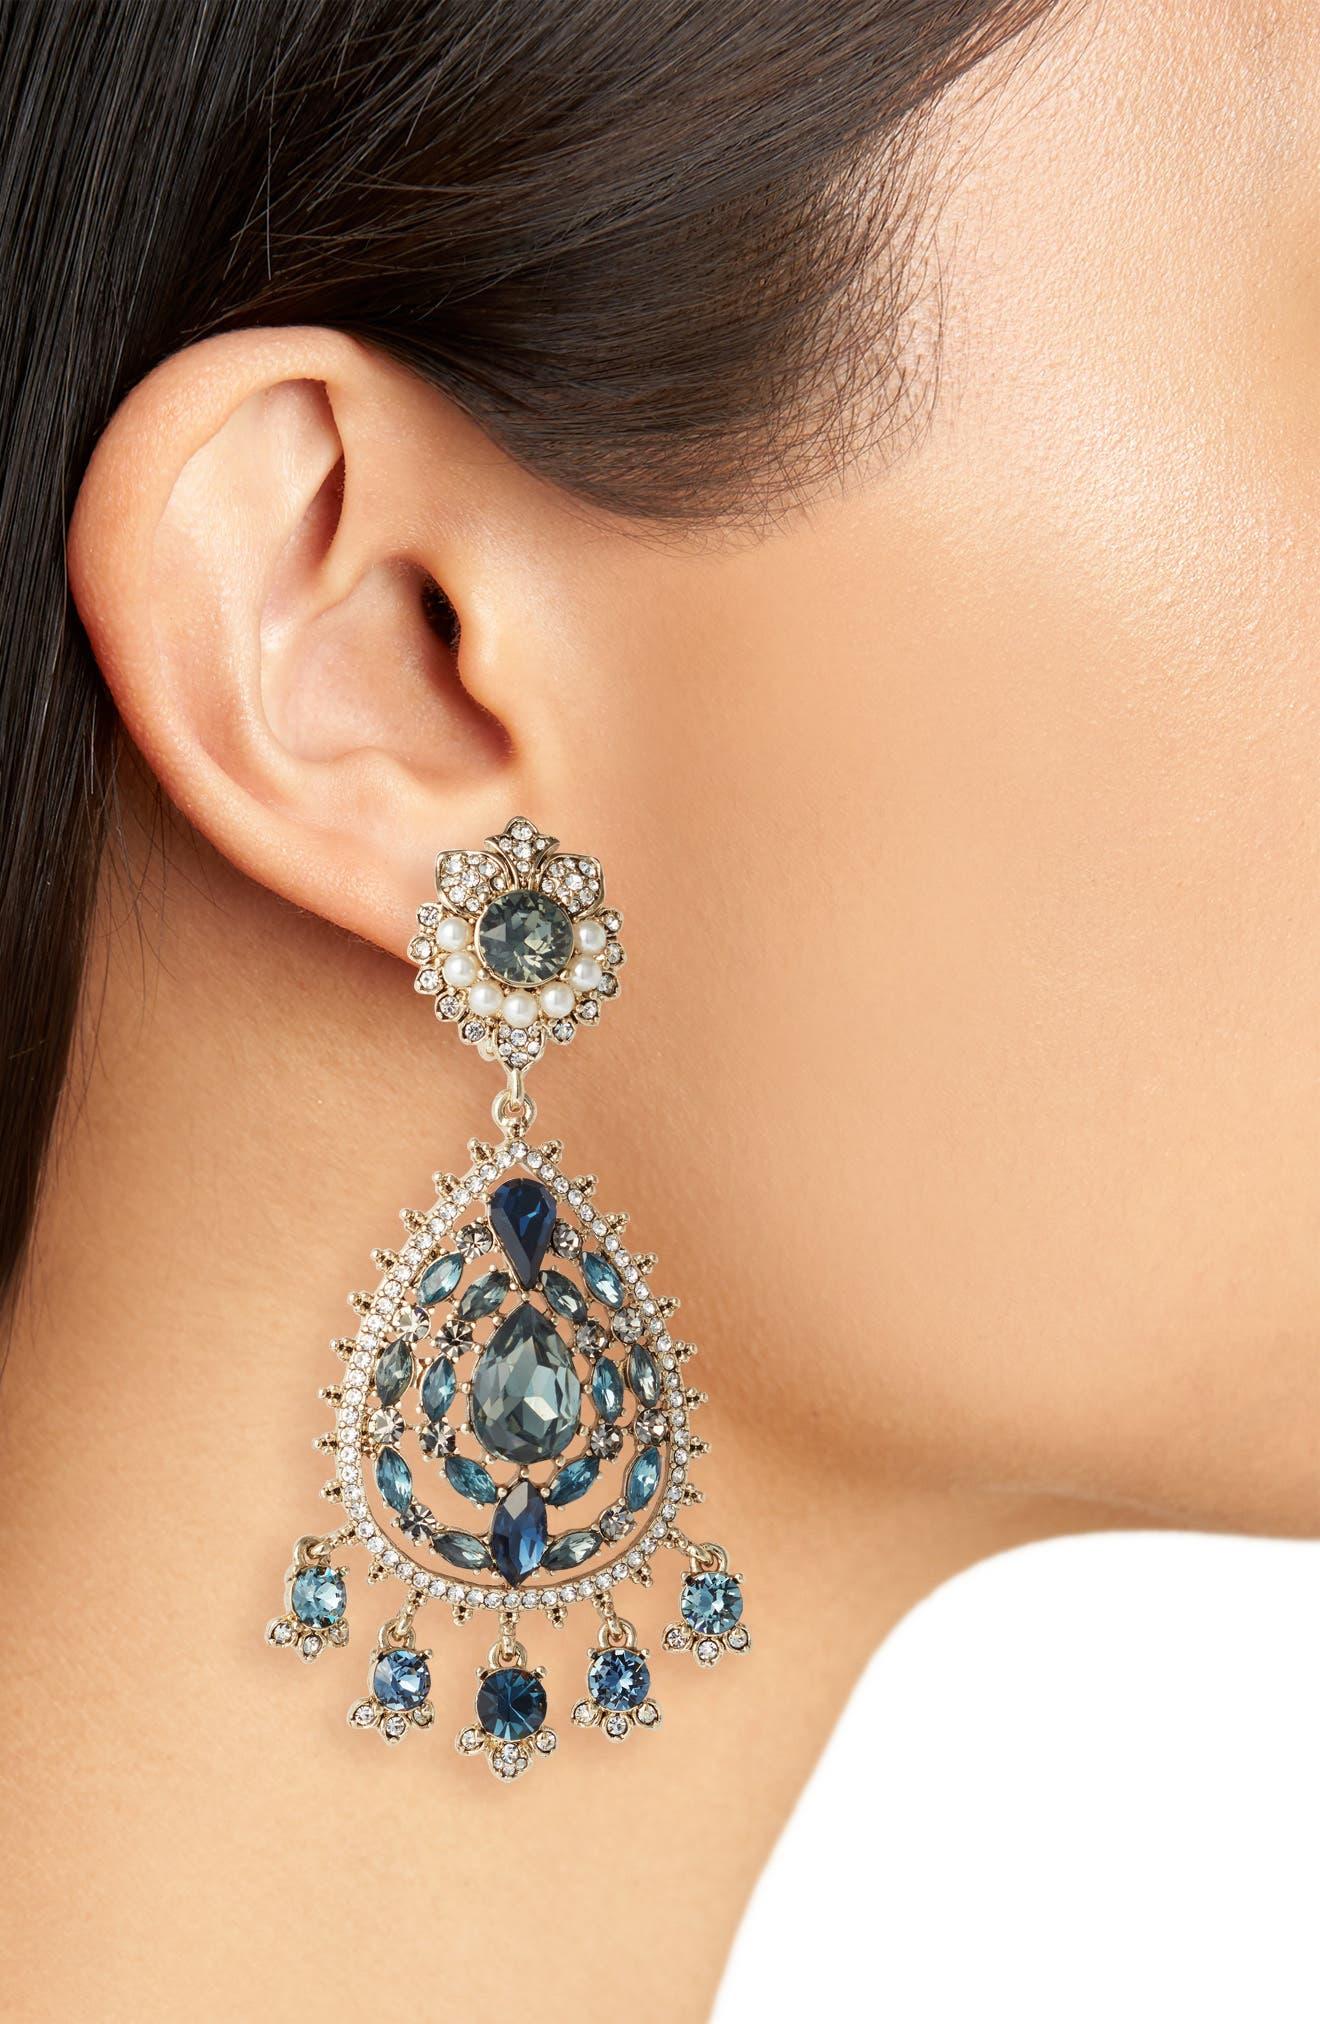 MARCHESA, Chandelier Earrings, Alternate thumbnail 2, color, BLUE MULTI/ GOLD